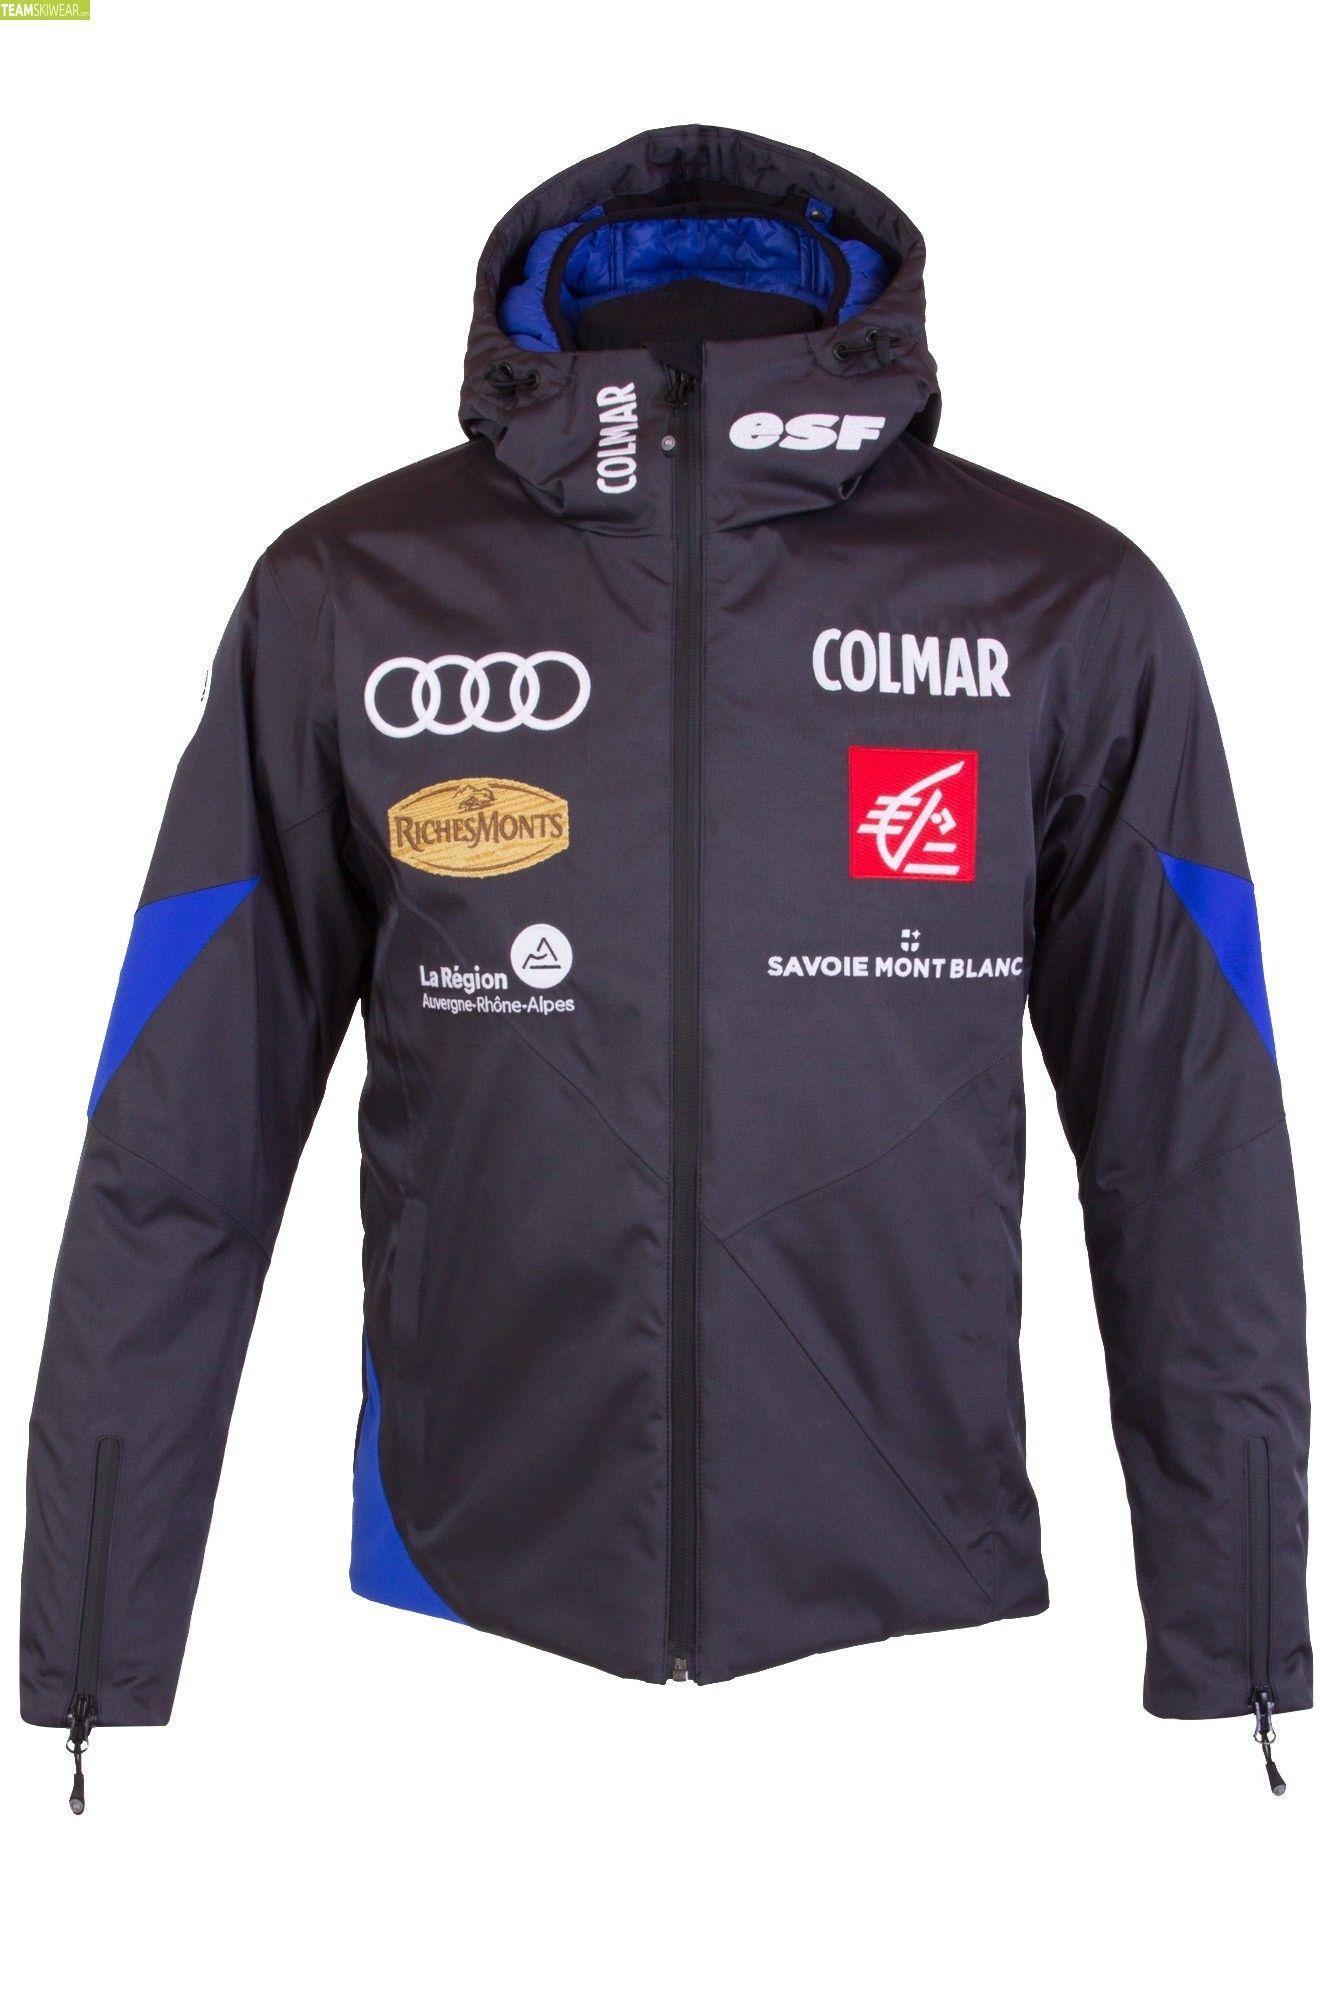 Colmar Men Moonlight French Team Jacket Grey Blue